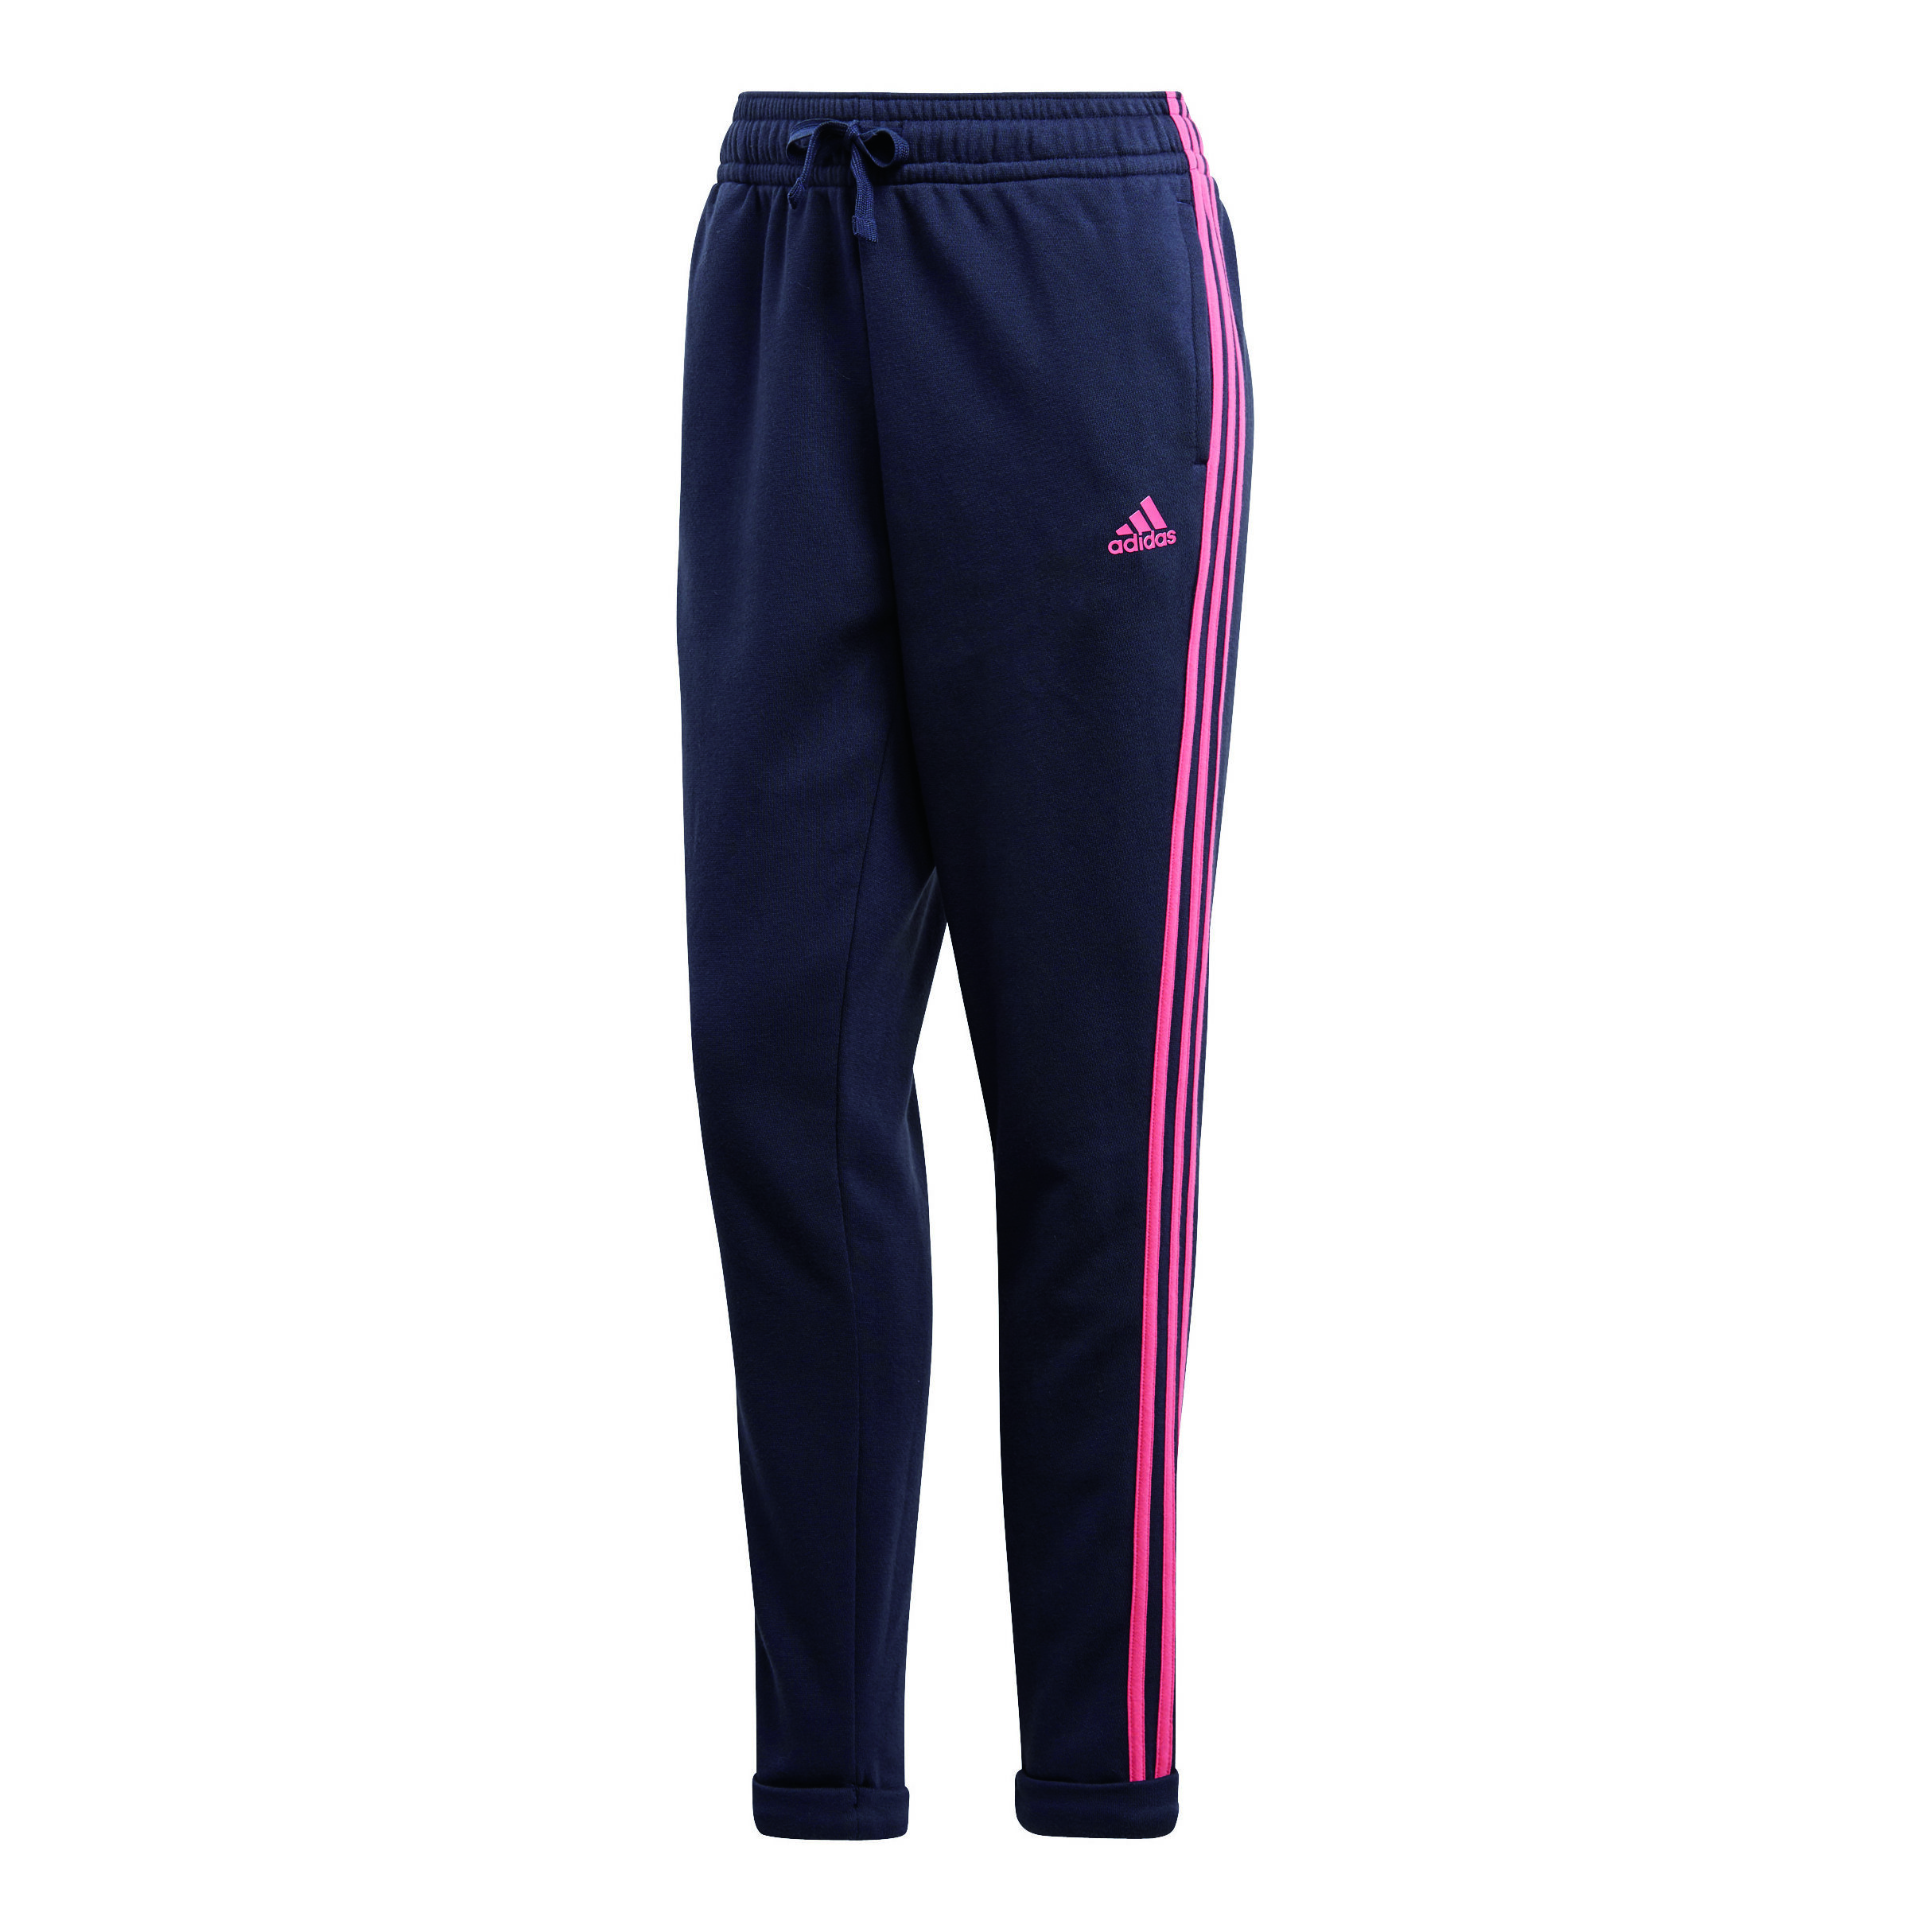 adidas Co Energize Trainingsanzug Damen Dunkelblau, Pink